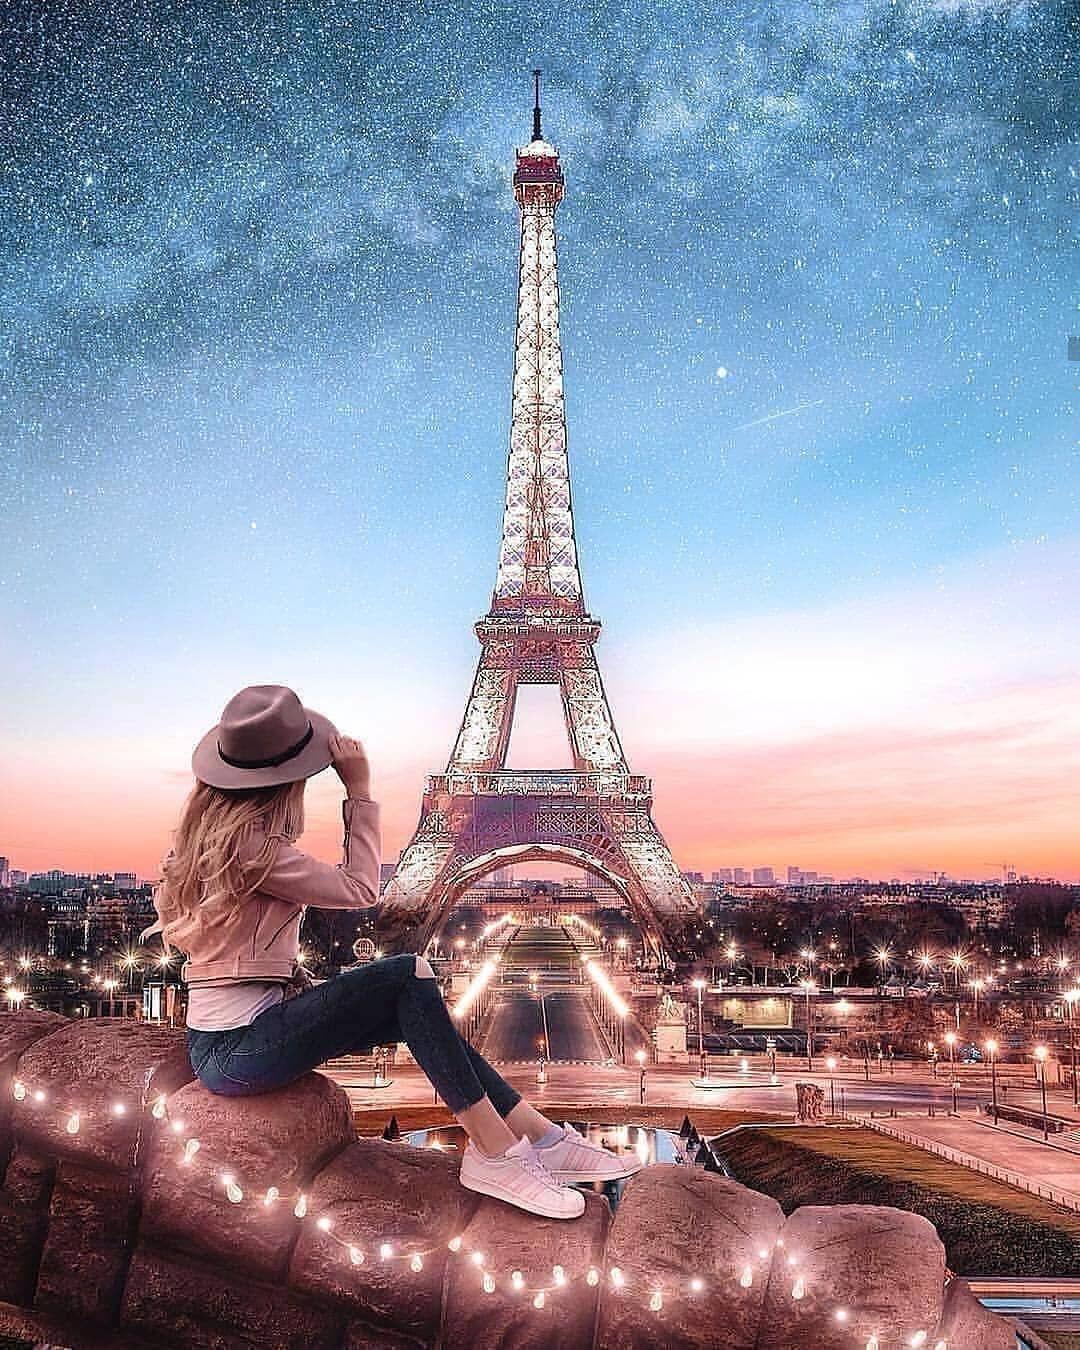 Girly Paris Wallpapers   Top Girly Paris Backgrounds 1080x1350